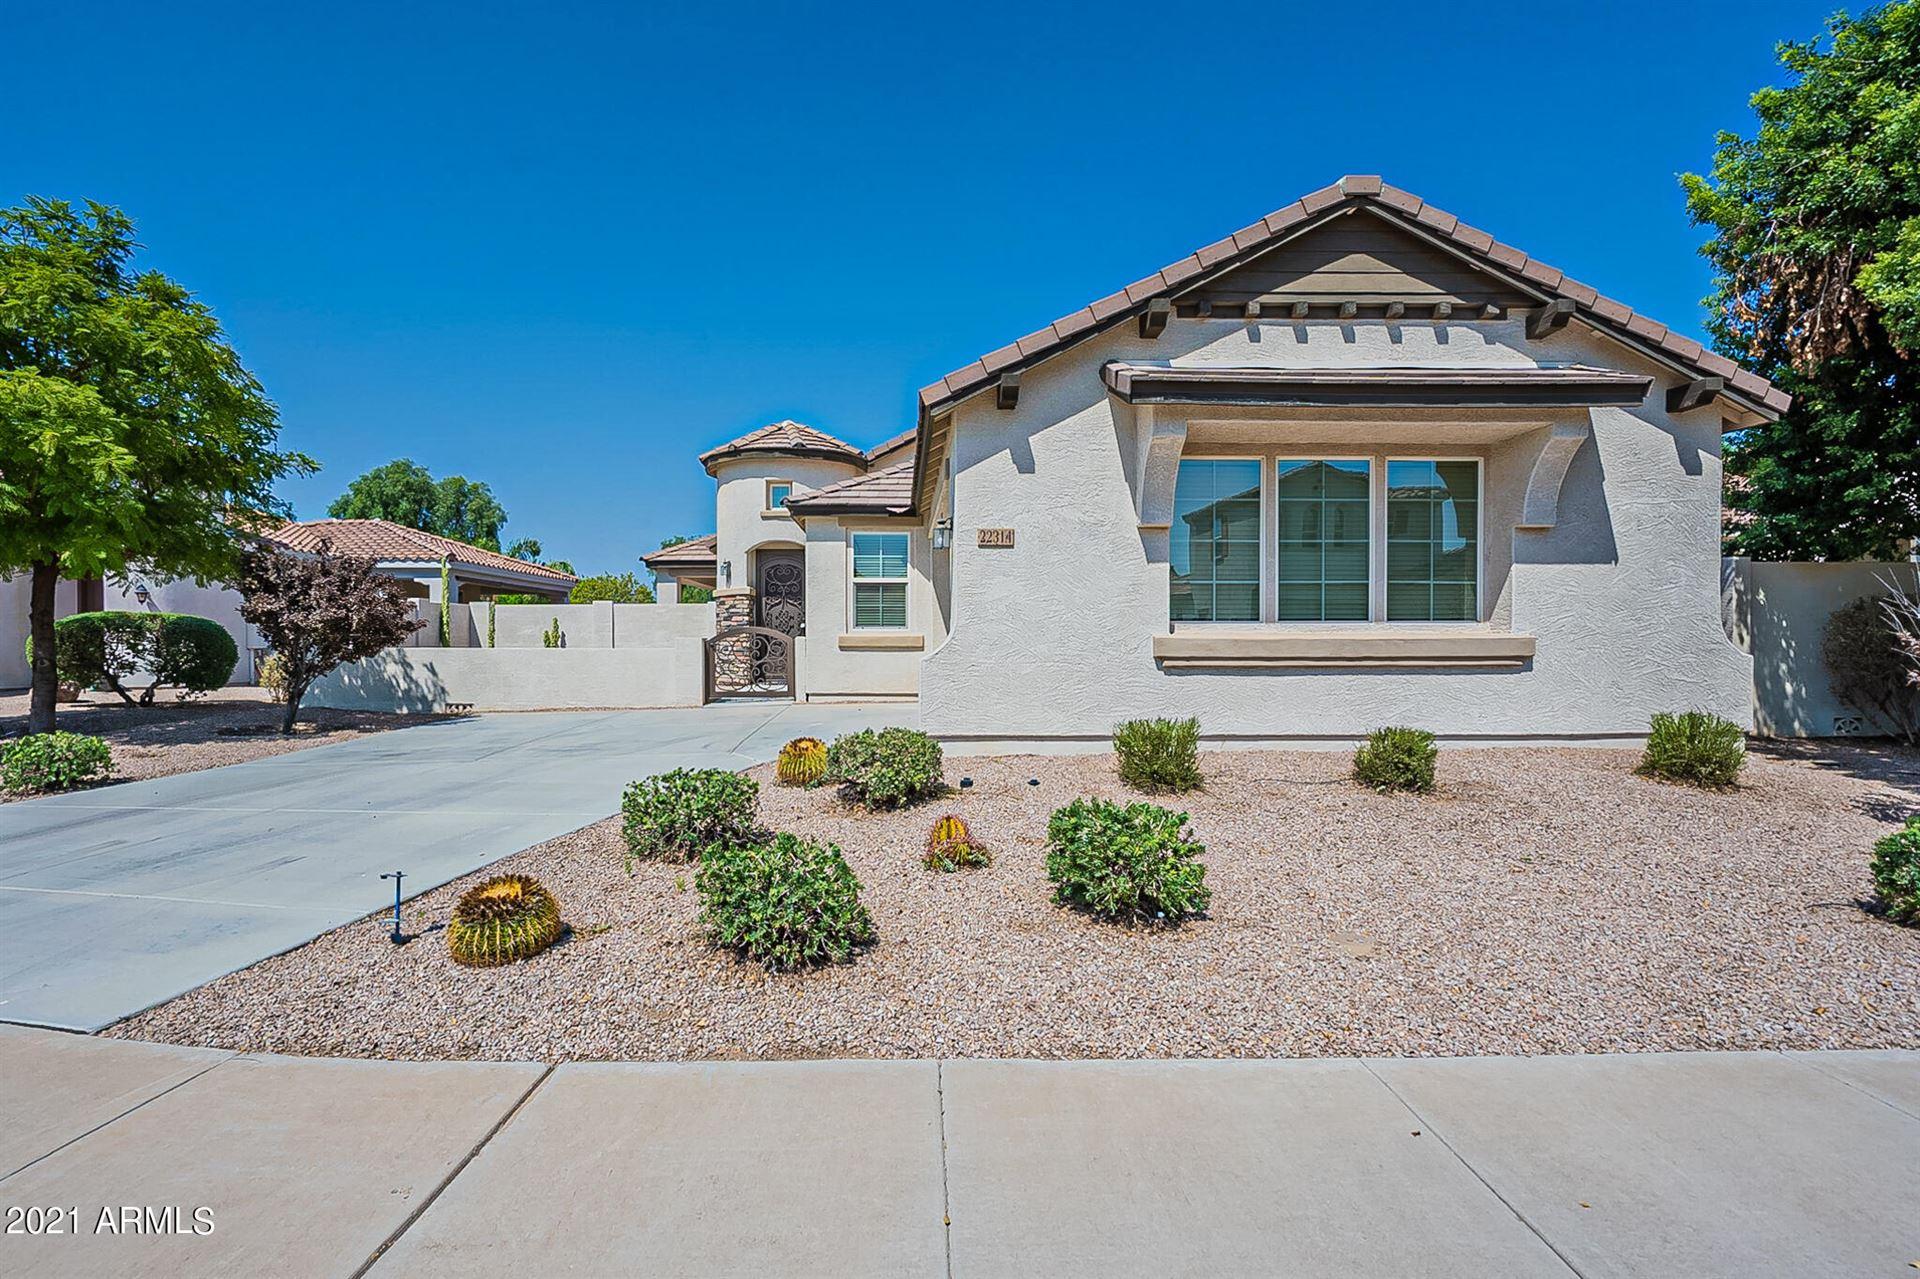 Photo of 22314 E CHERRYWOOD Drive, Queen Creek, AZ 85142 (MLS # 6295209)